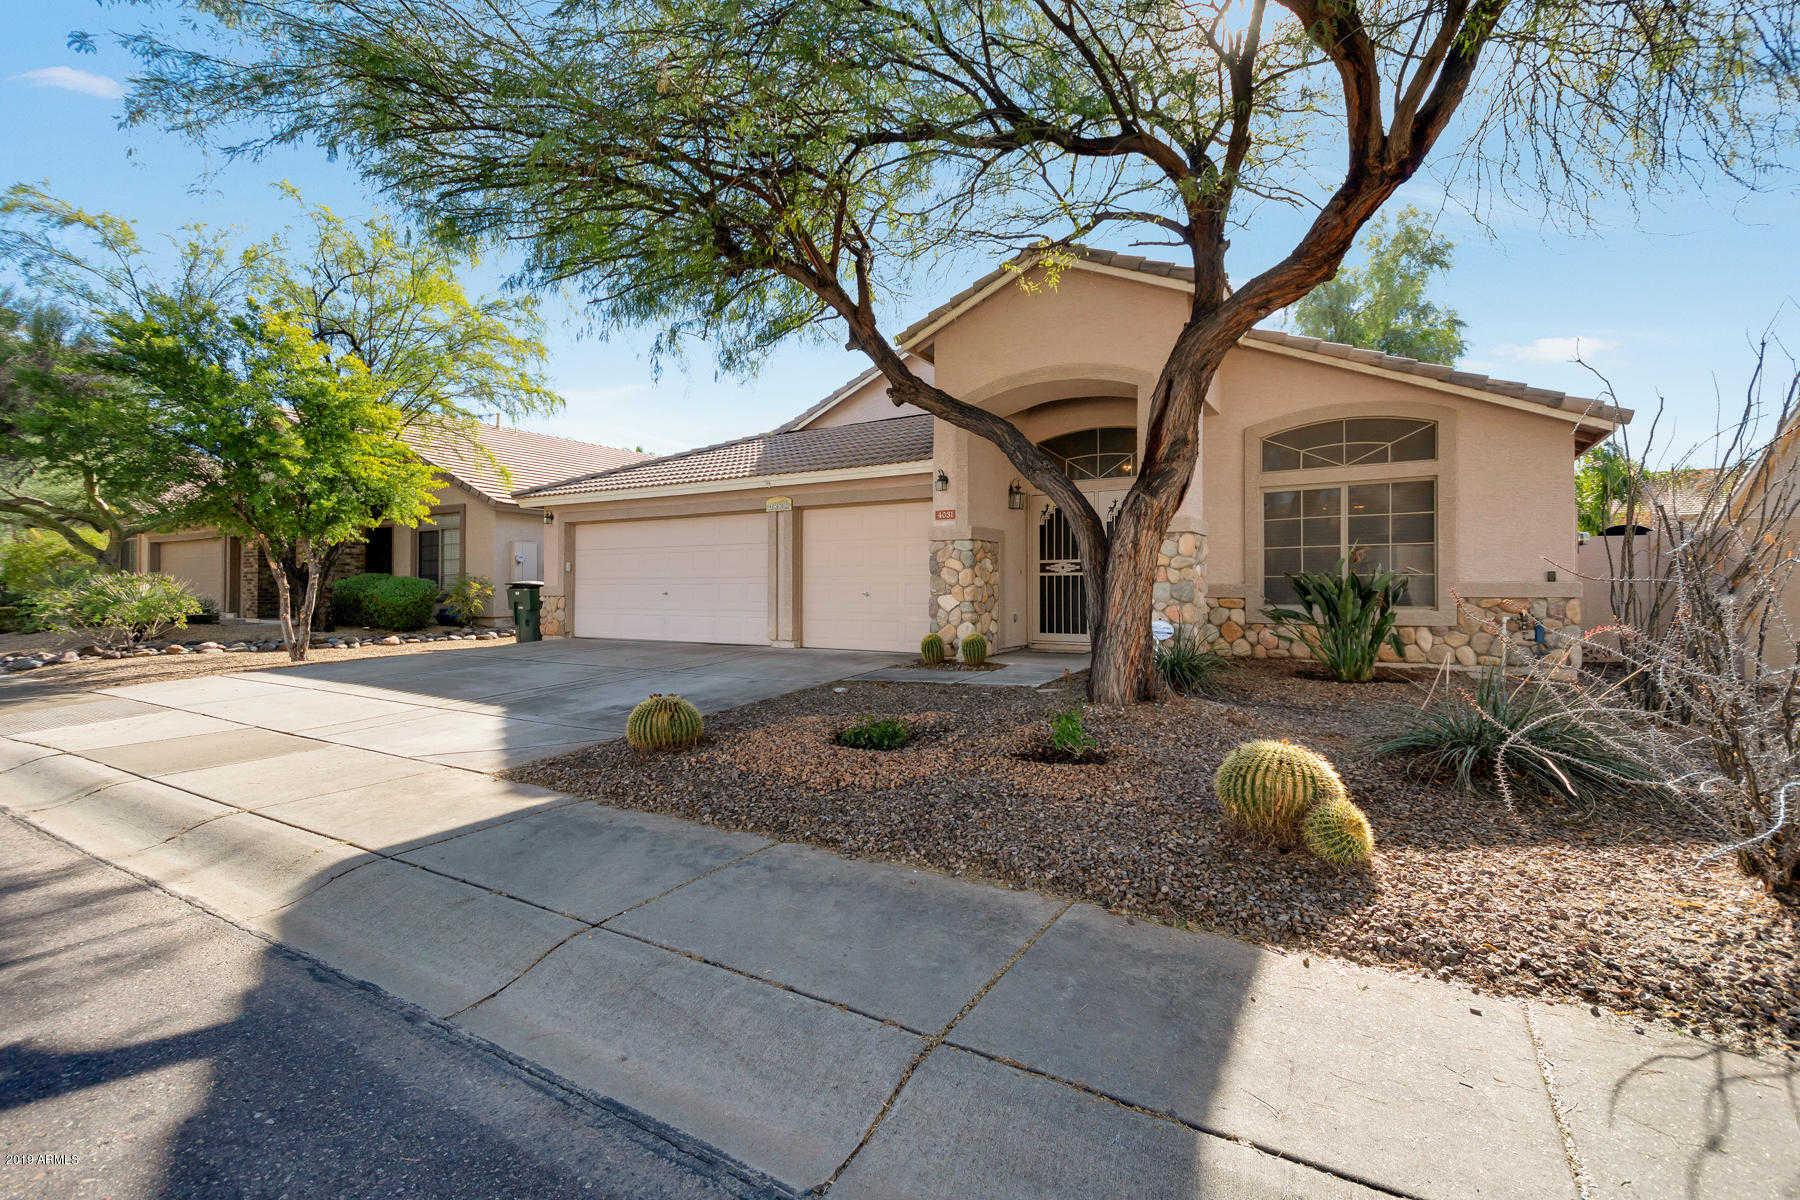 $439,900 - 4Br/2Ba - Home for Sale in Tatum Highlands Parcel 22a, Phoenix